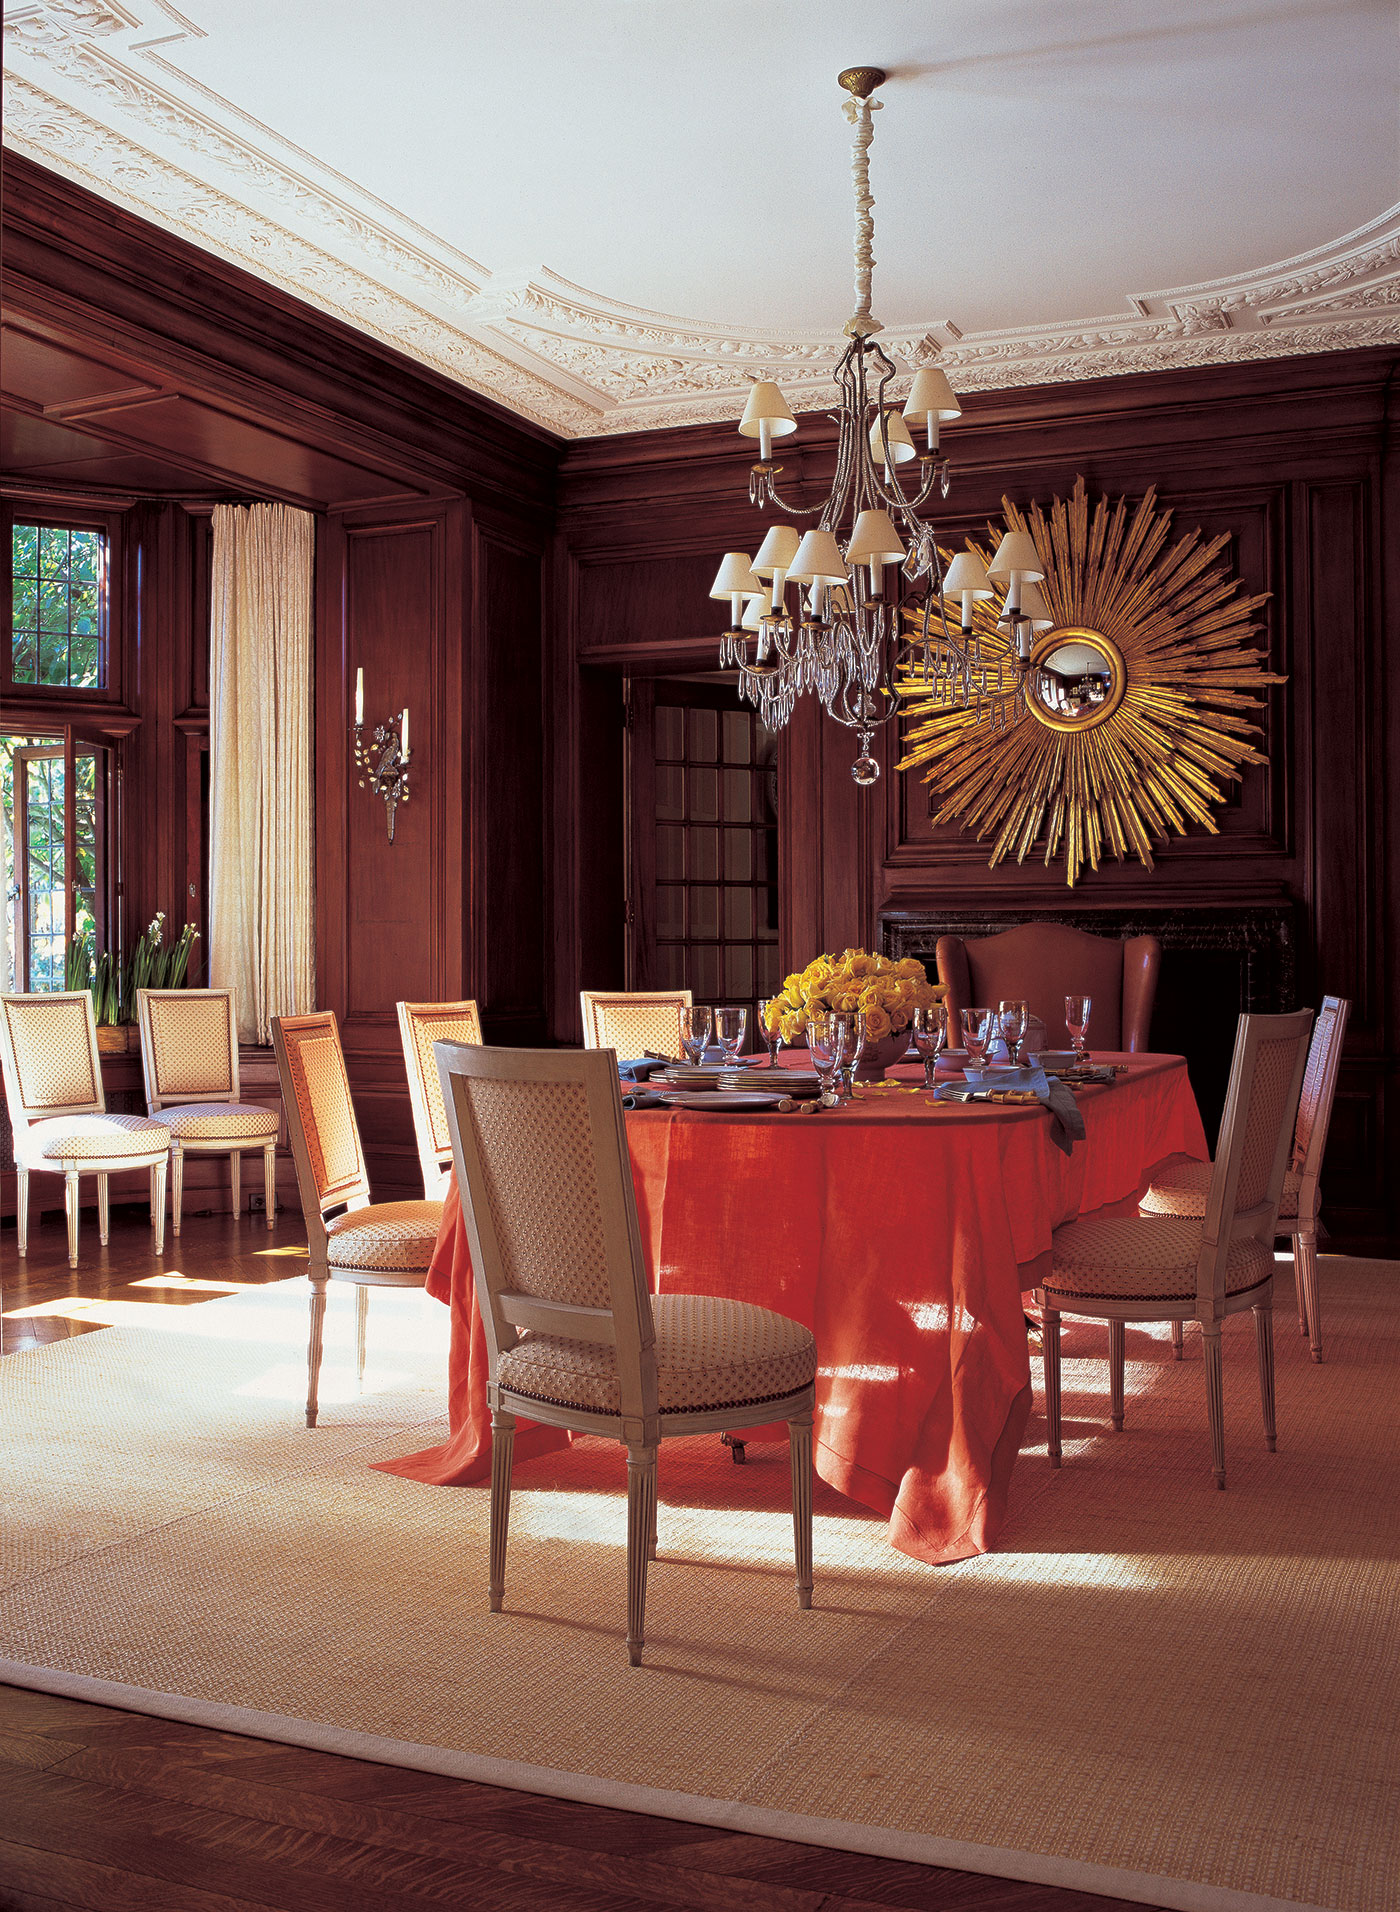 40 Lavish Rooms With Wood Paneled Walls Chairish Blog